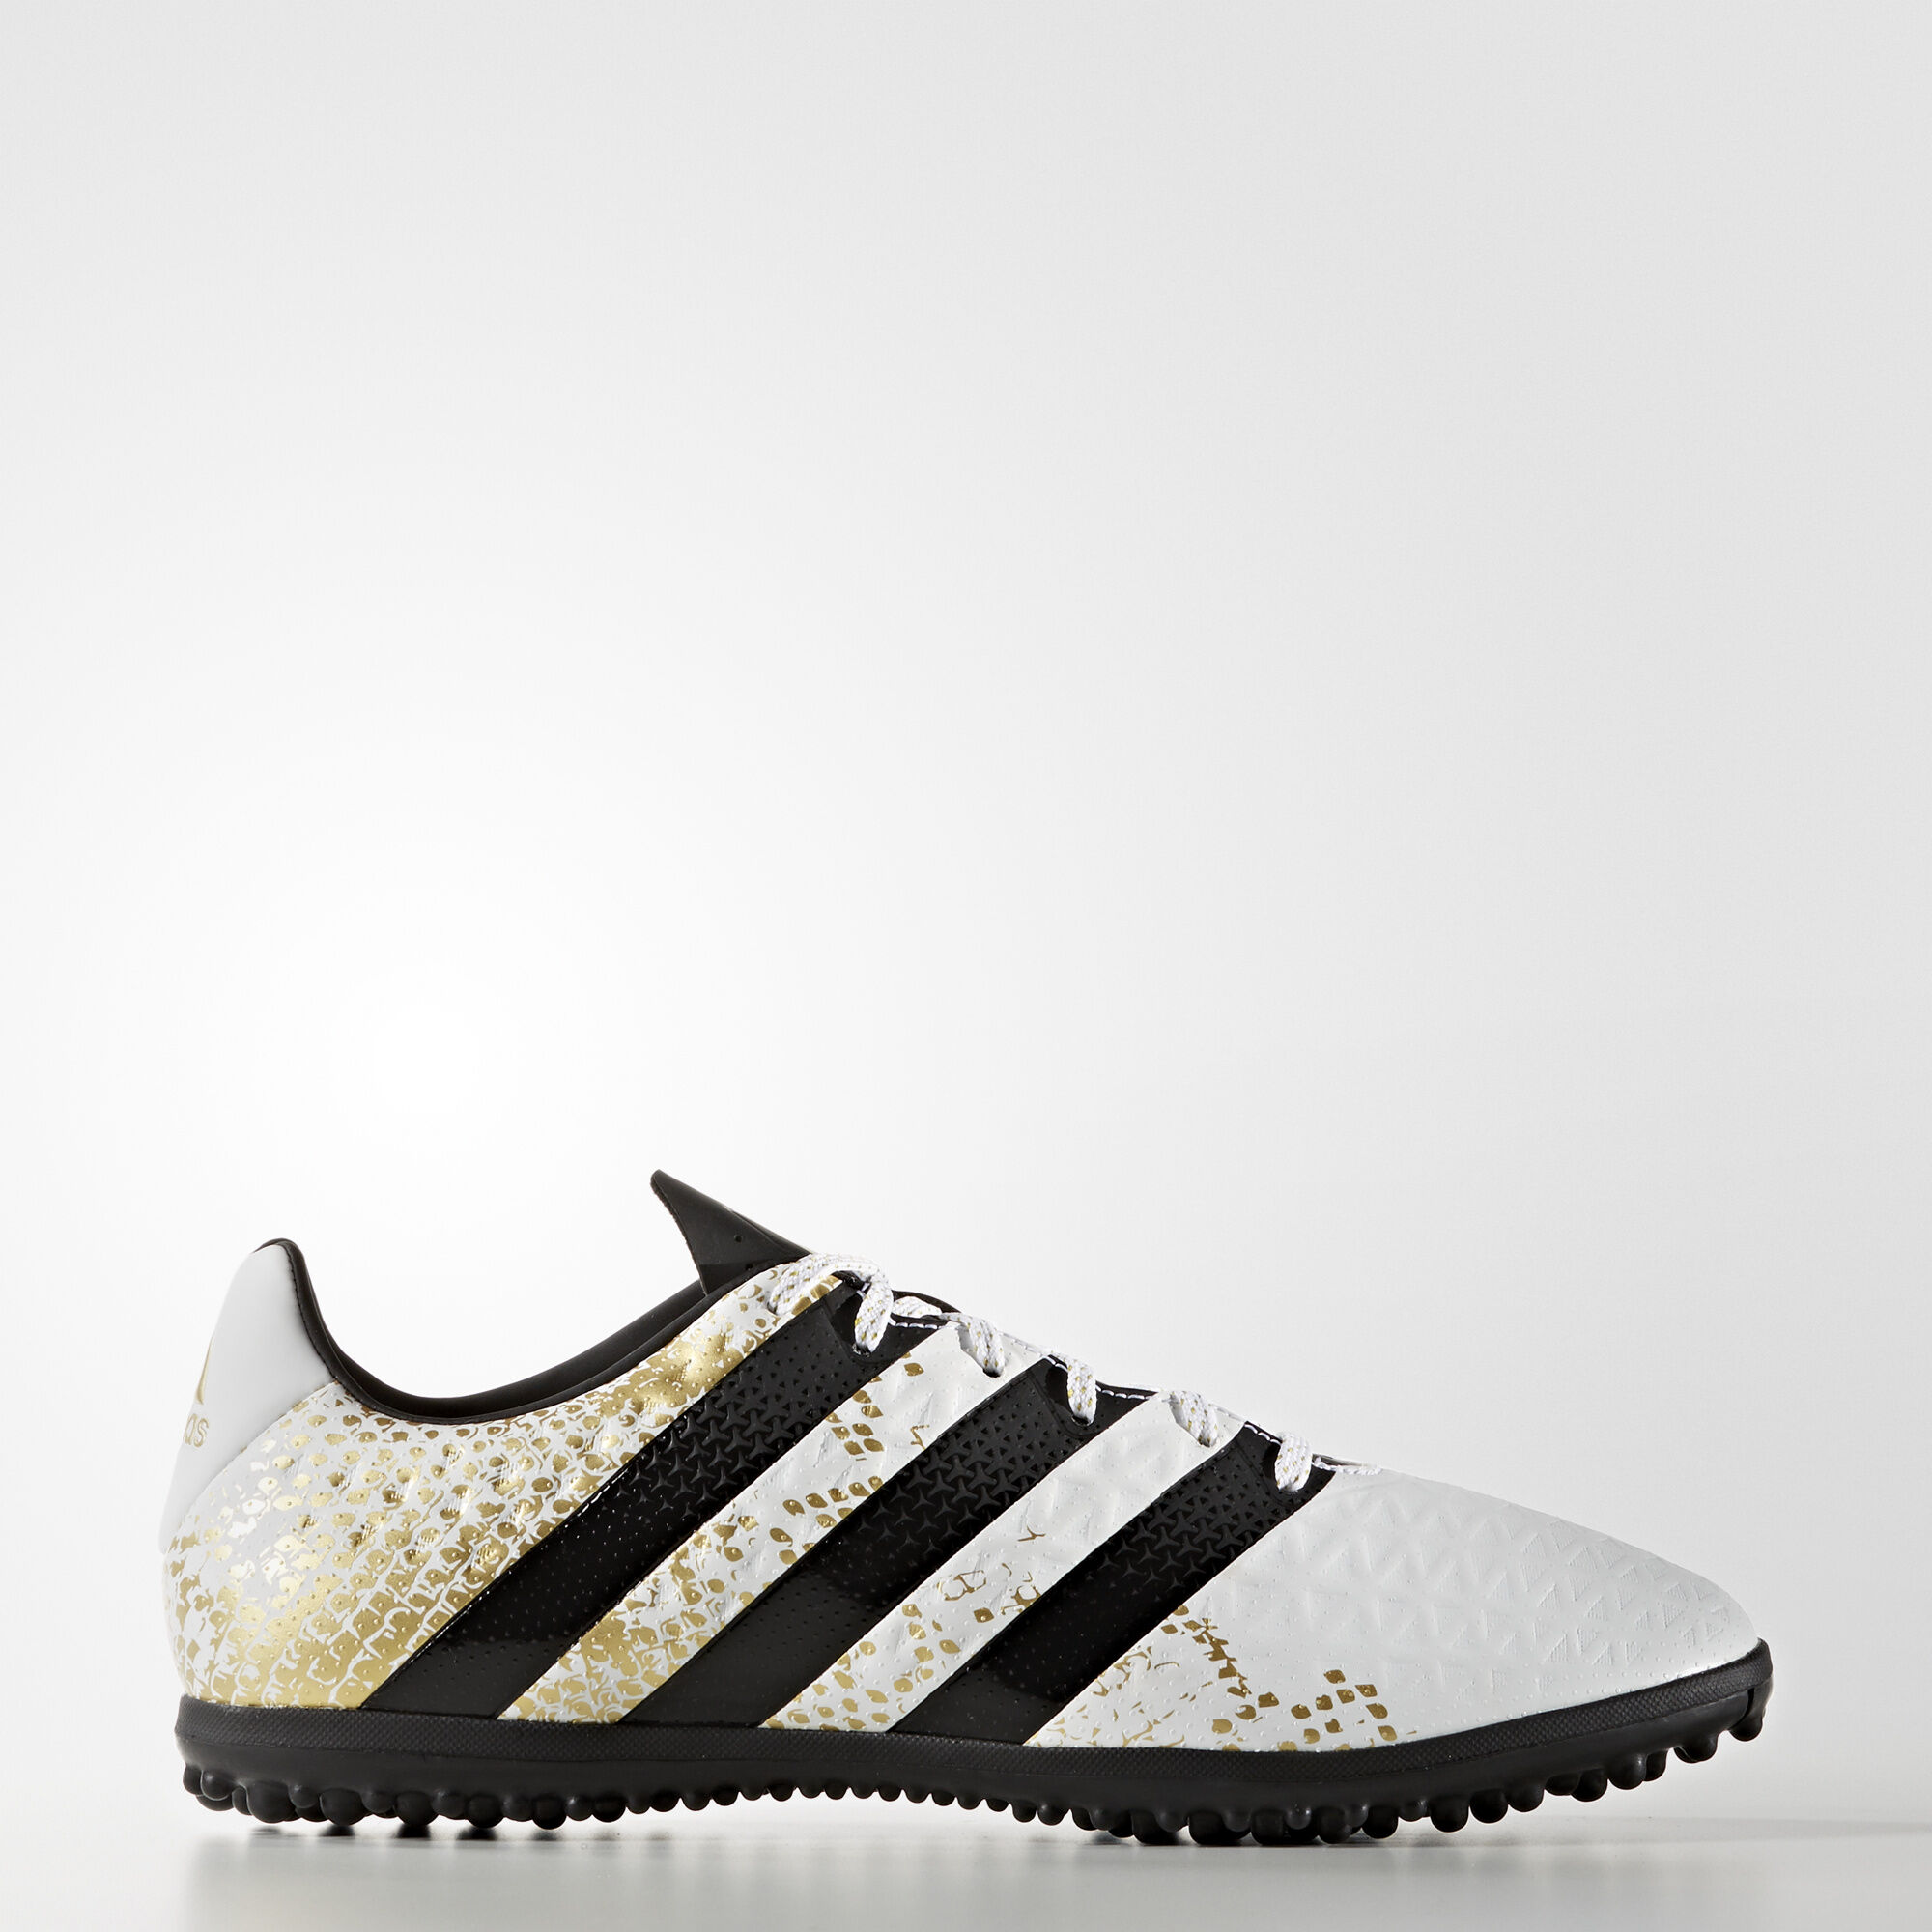 Adidas guayos para c sped artificial ace 16 3 blanco - Cesped artificial colombia ...